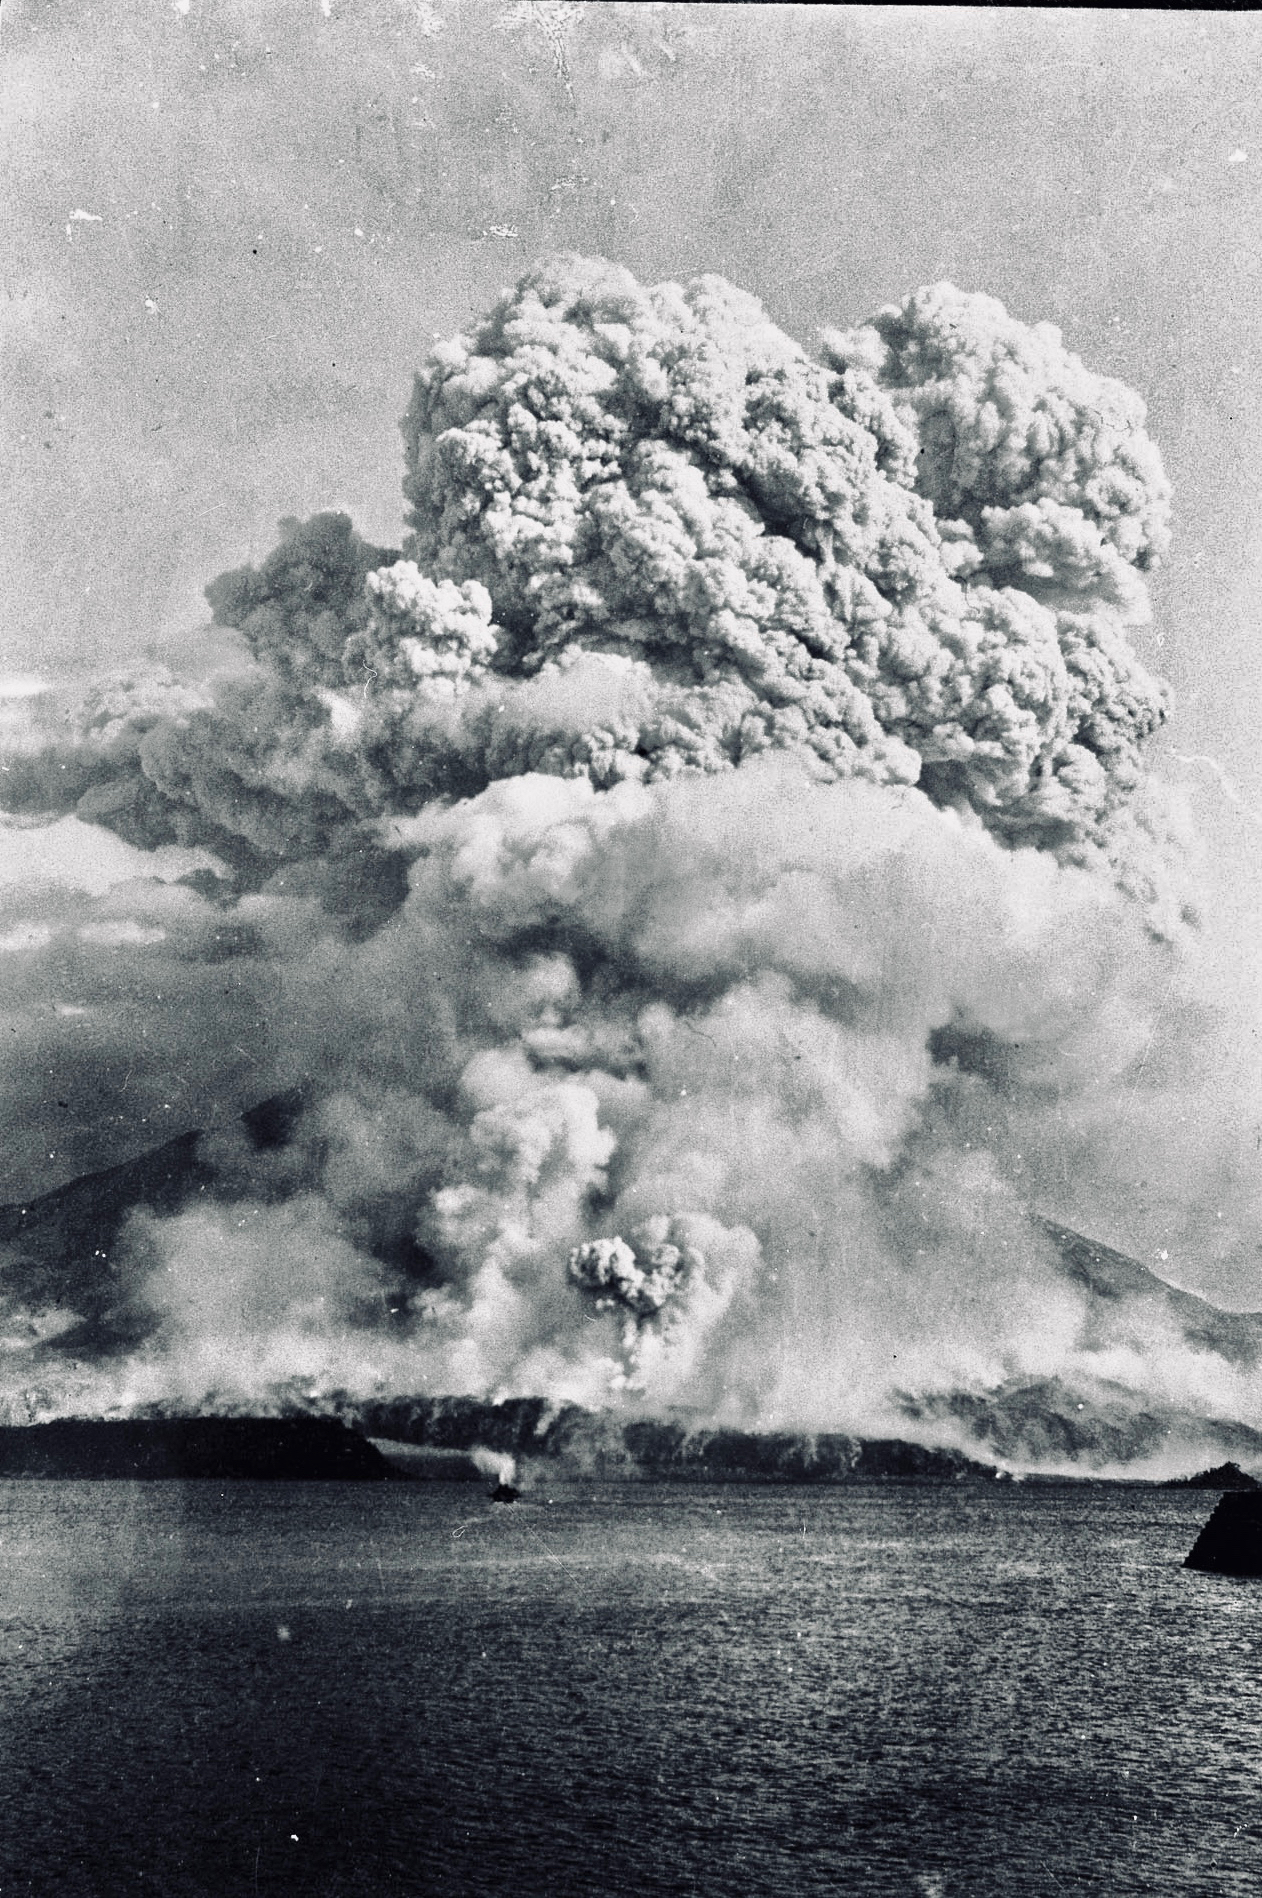 Sakurajima spewing ash 5 km high during the Taisho eruption of 1914